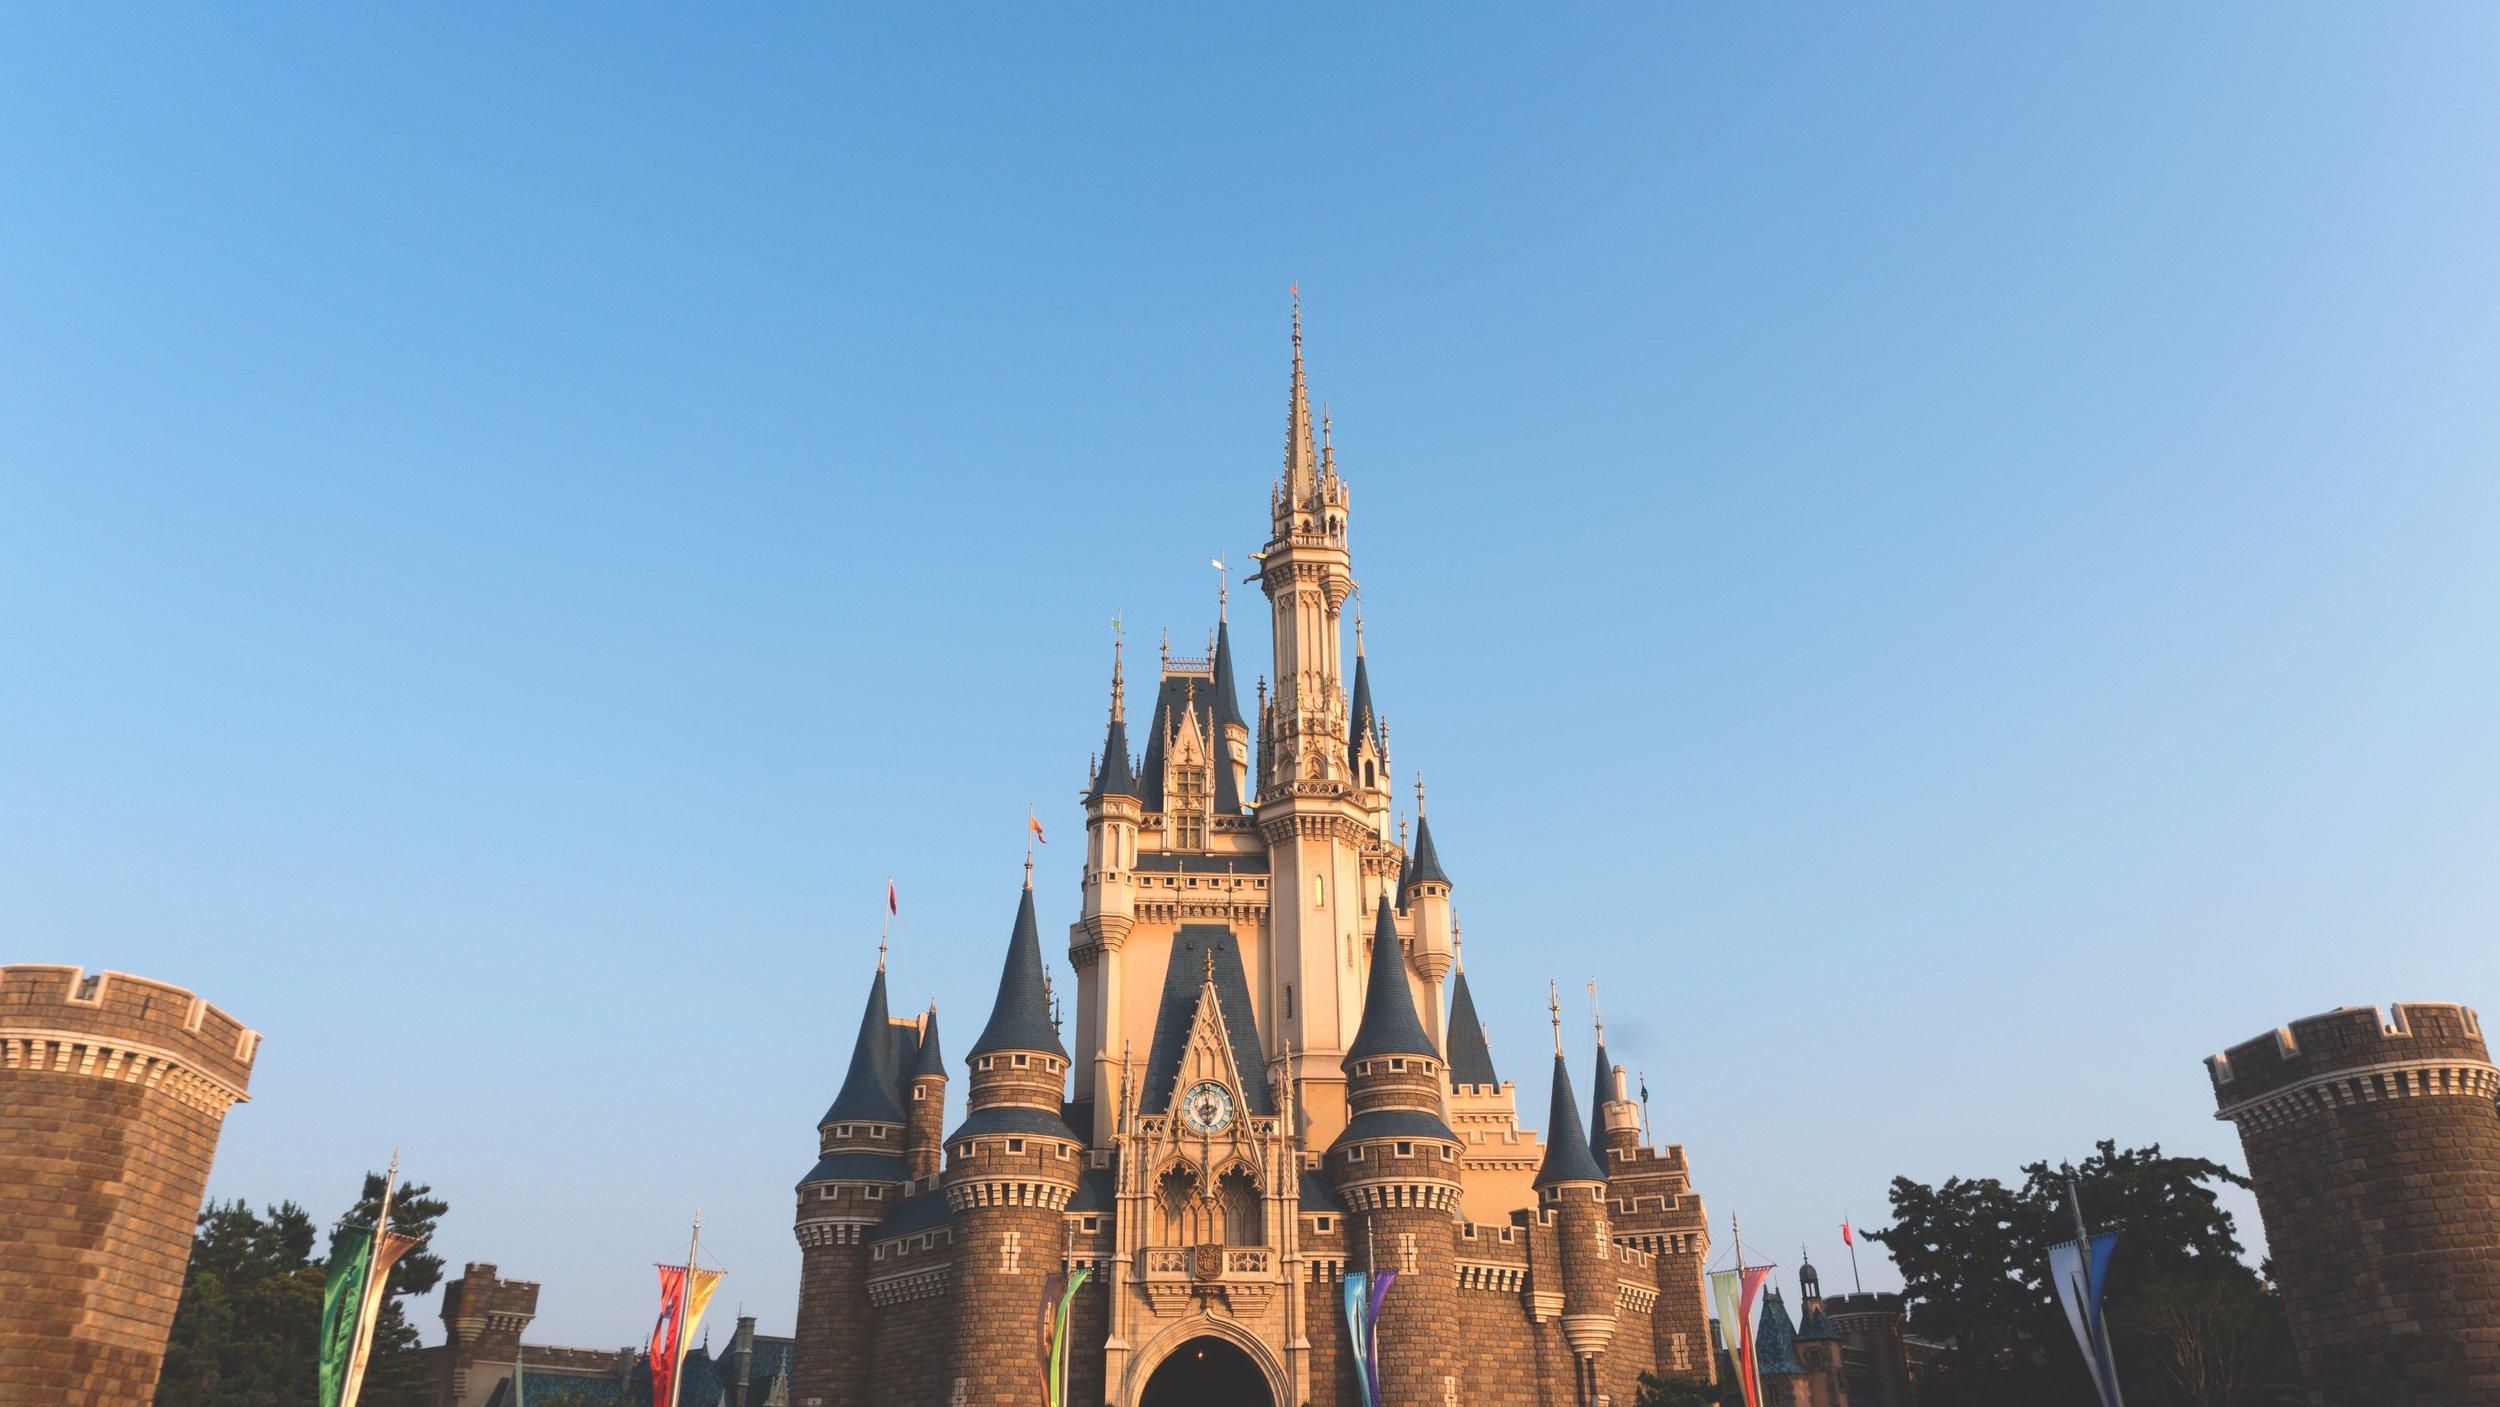 Japan - Tokyo Disneyland